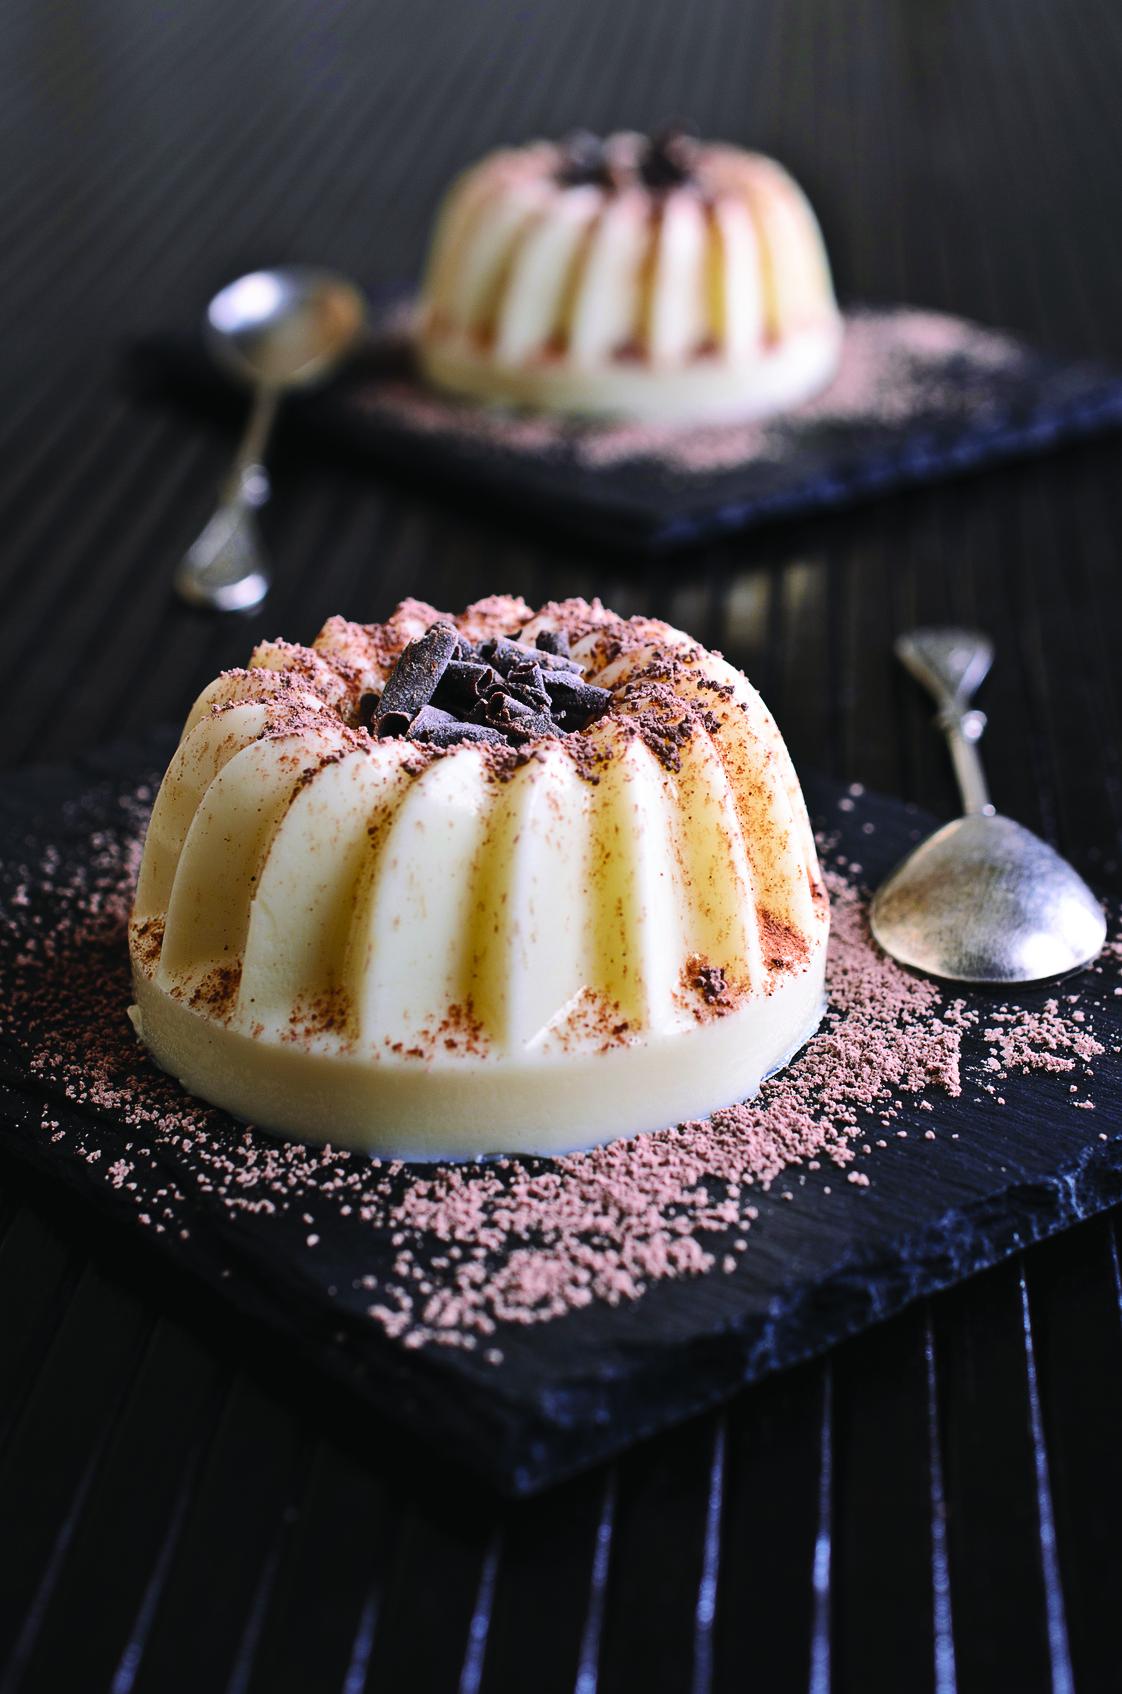 panna cotta ou flan chocolat blanc et coco un dessert. Black Bedroom Furniture Sets. Home Design Ideas